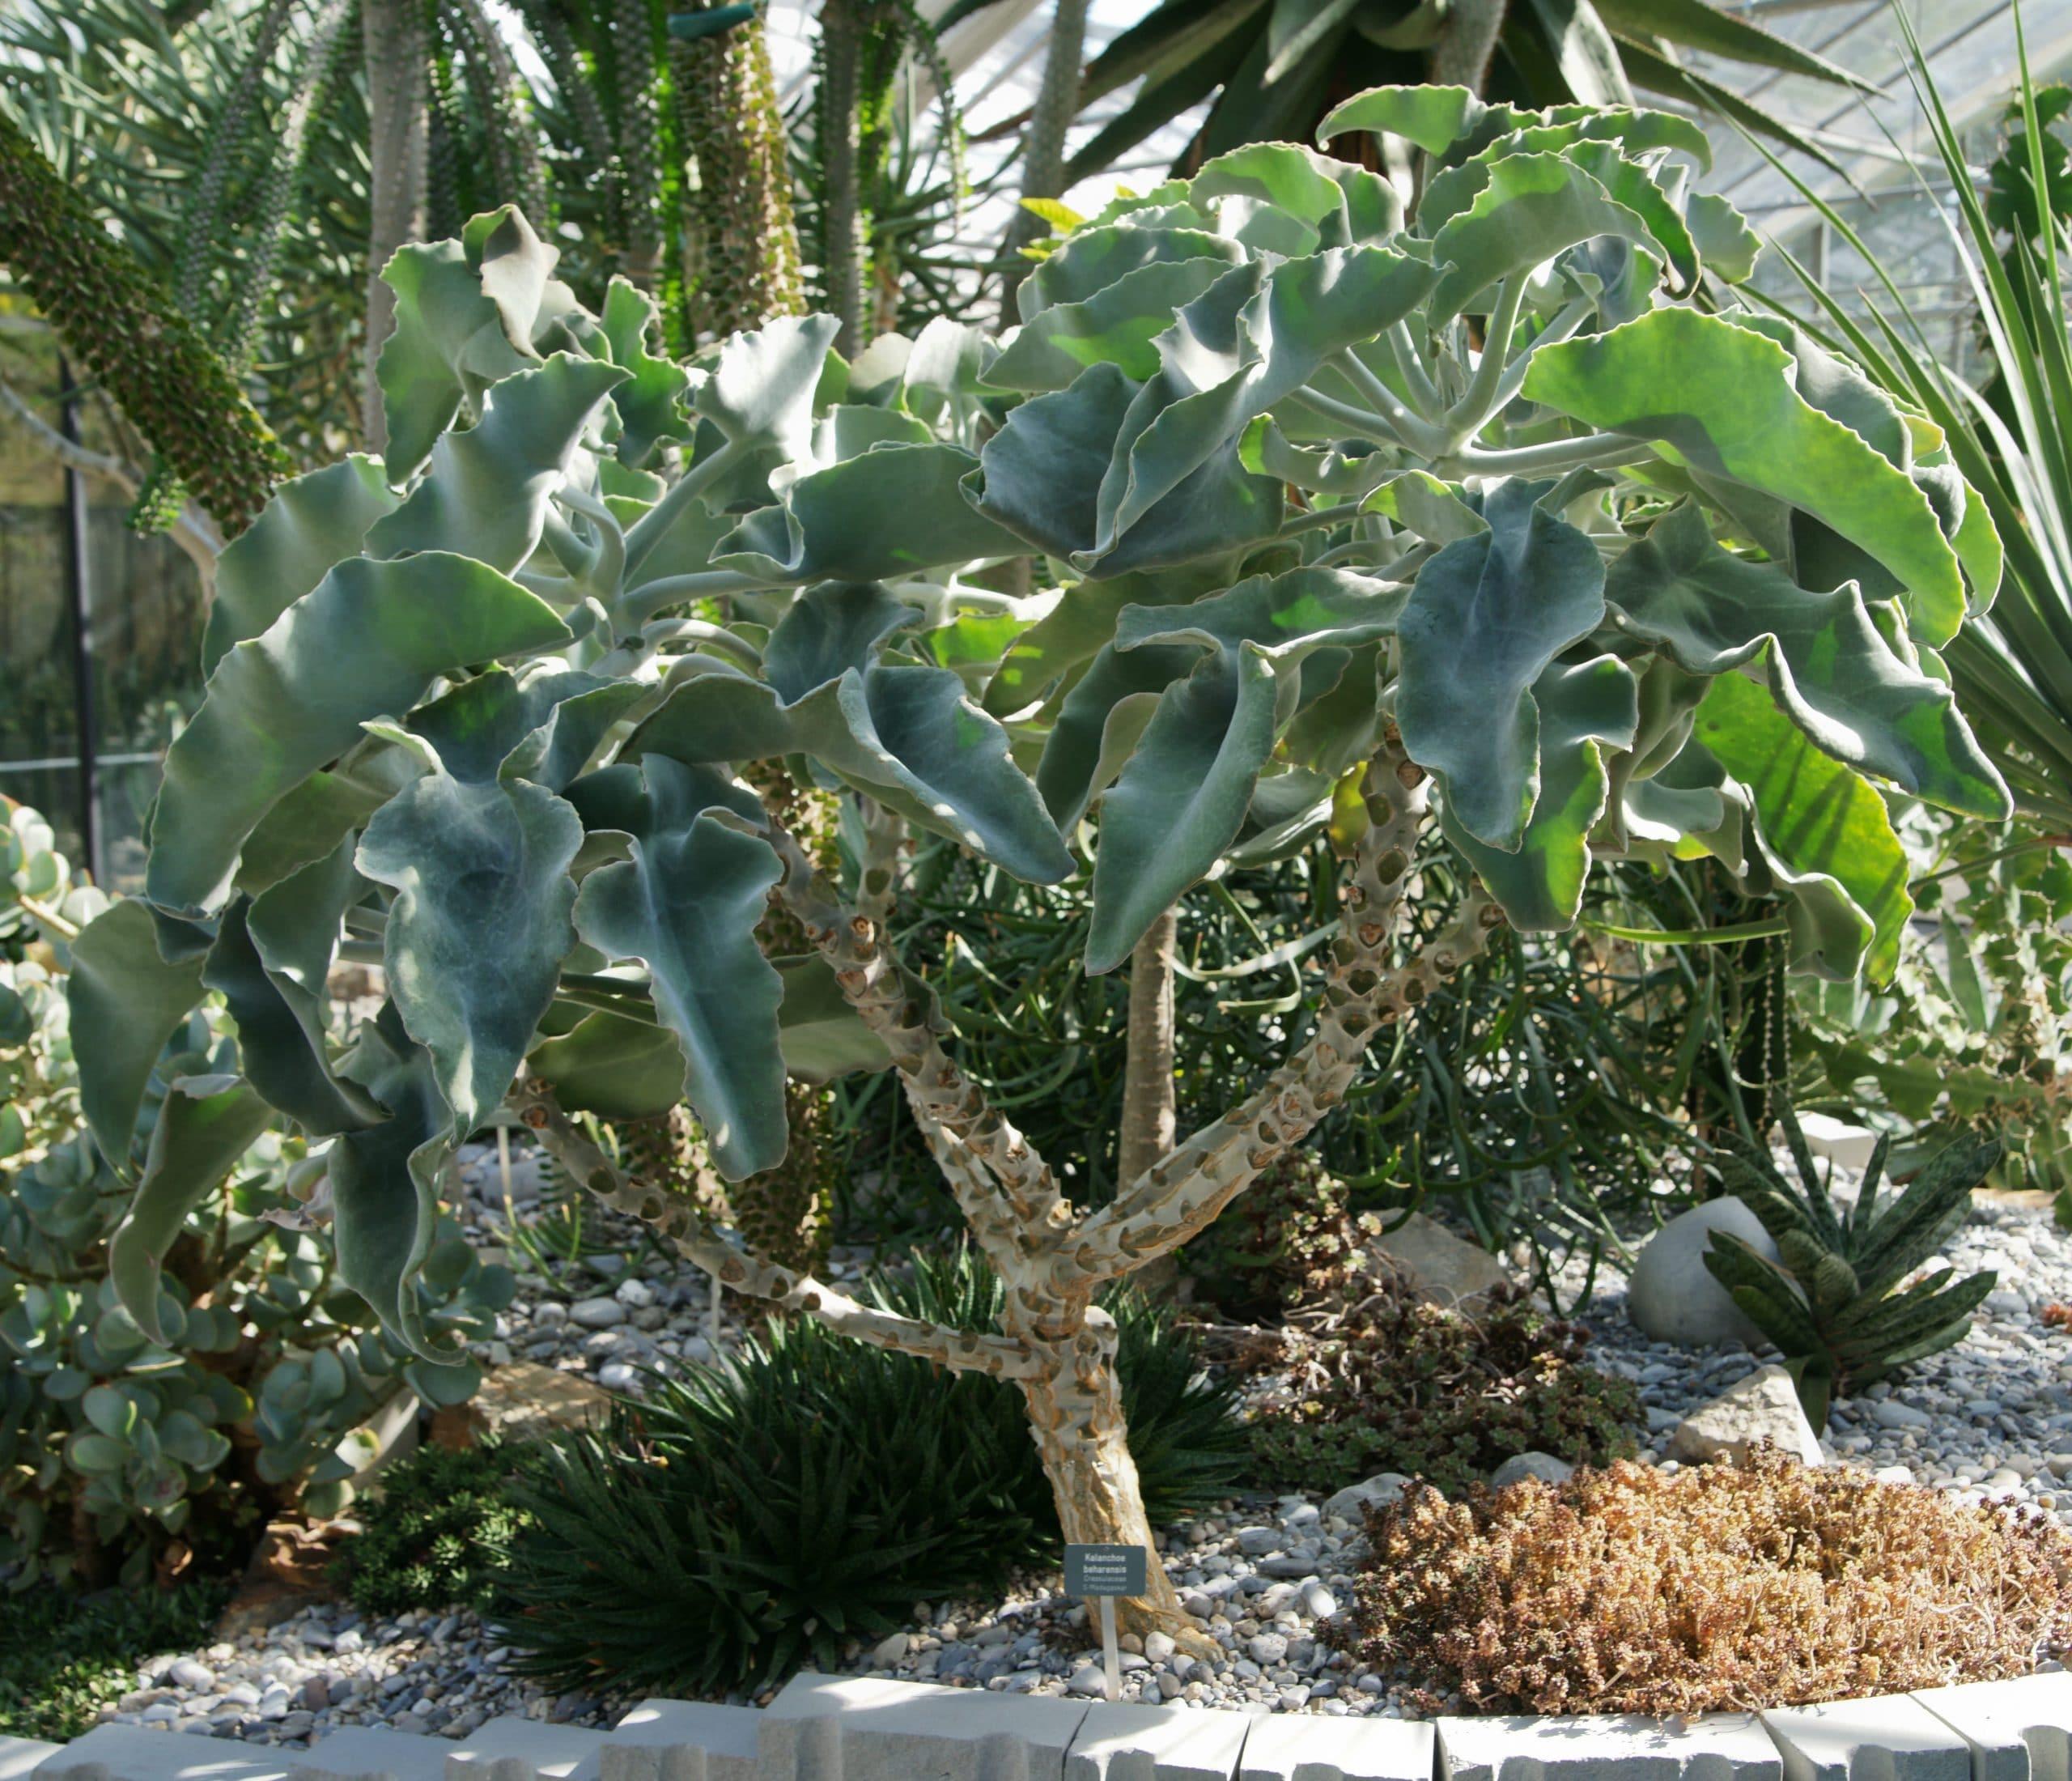 Vista de un arbusto adulto de Kalanchoe beharensis